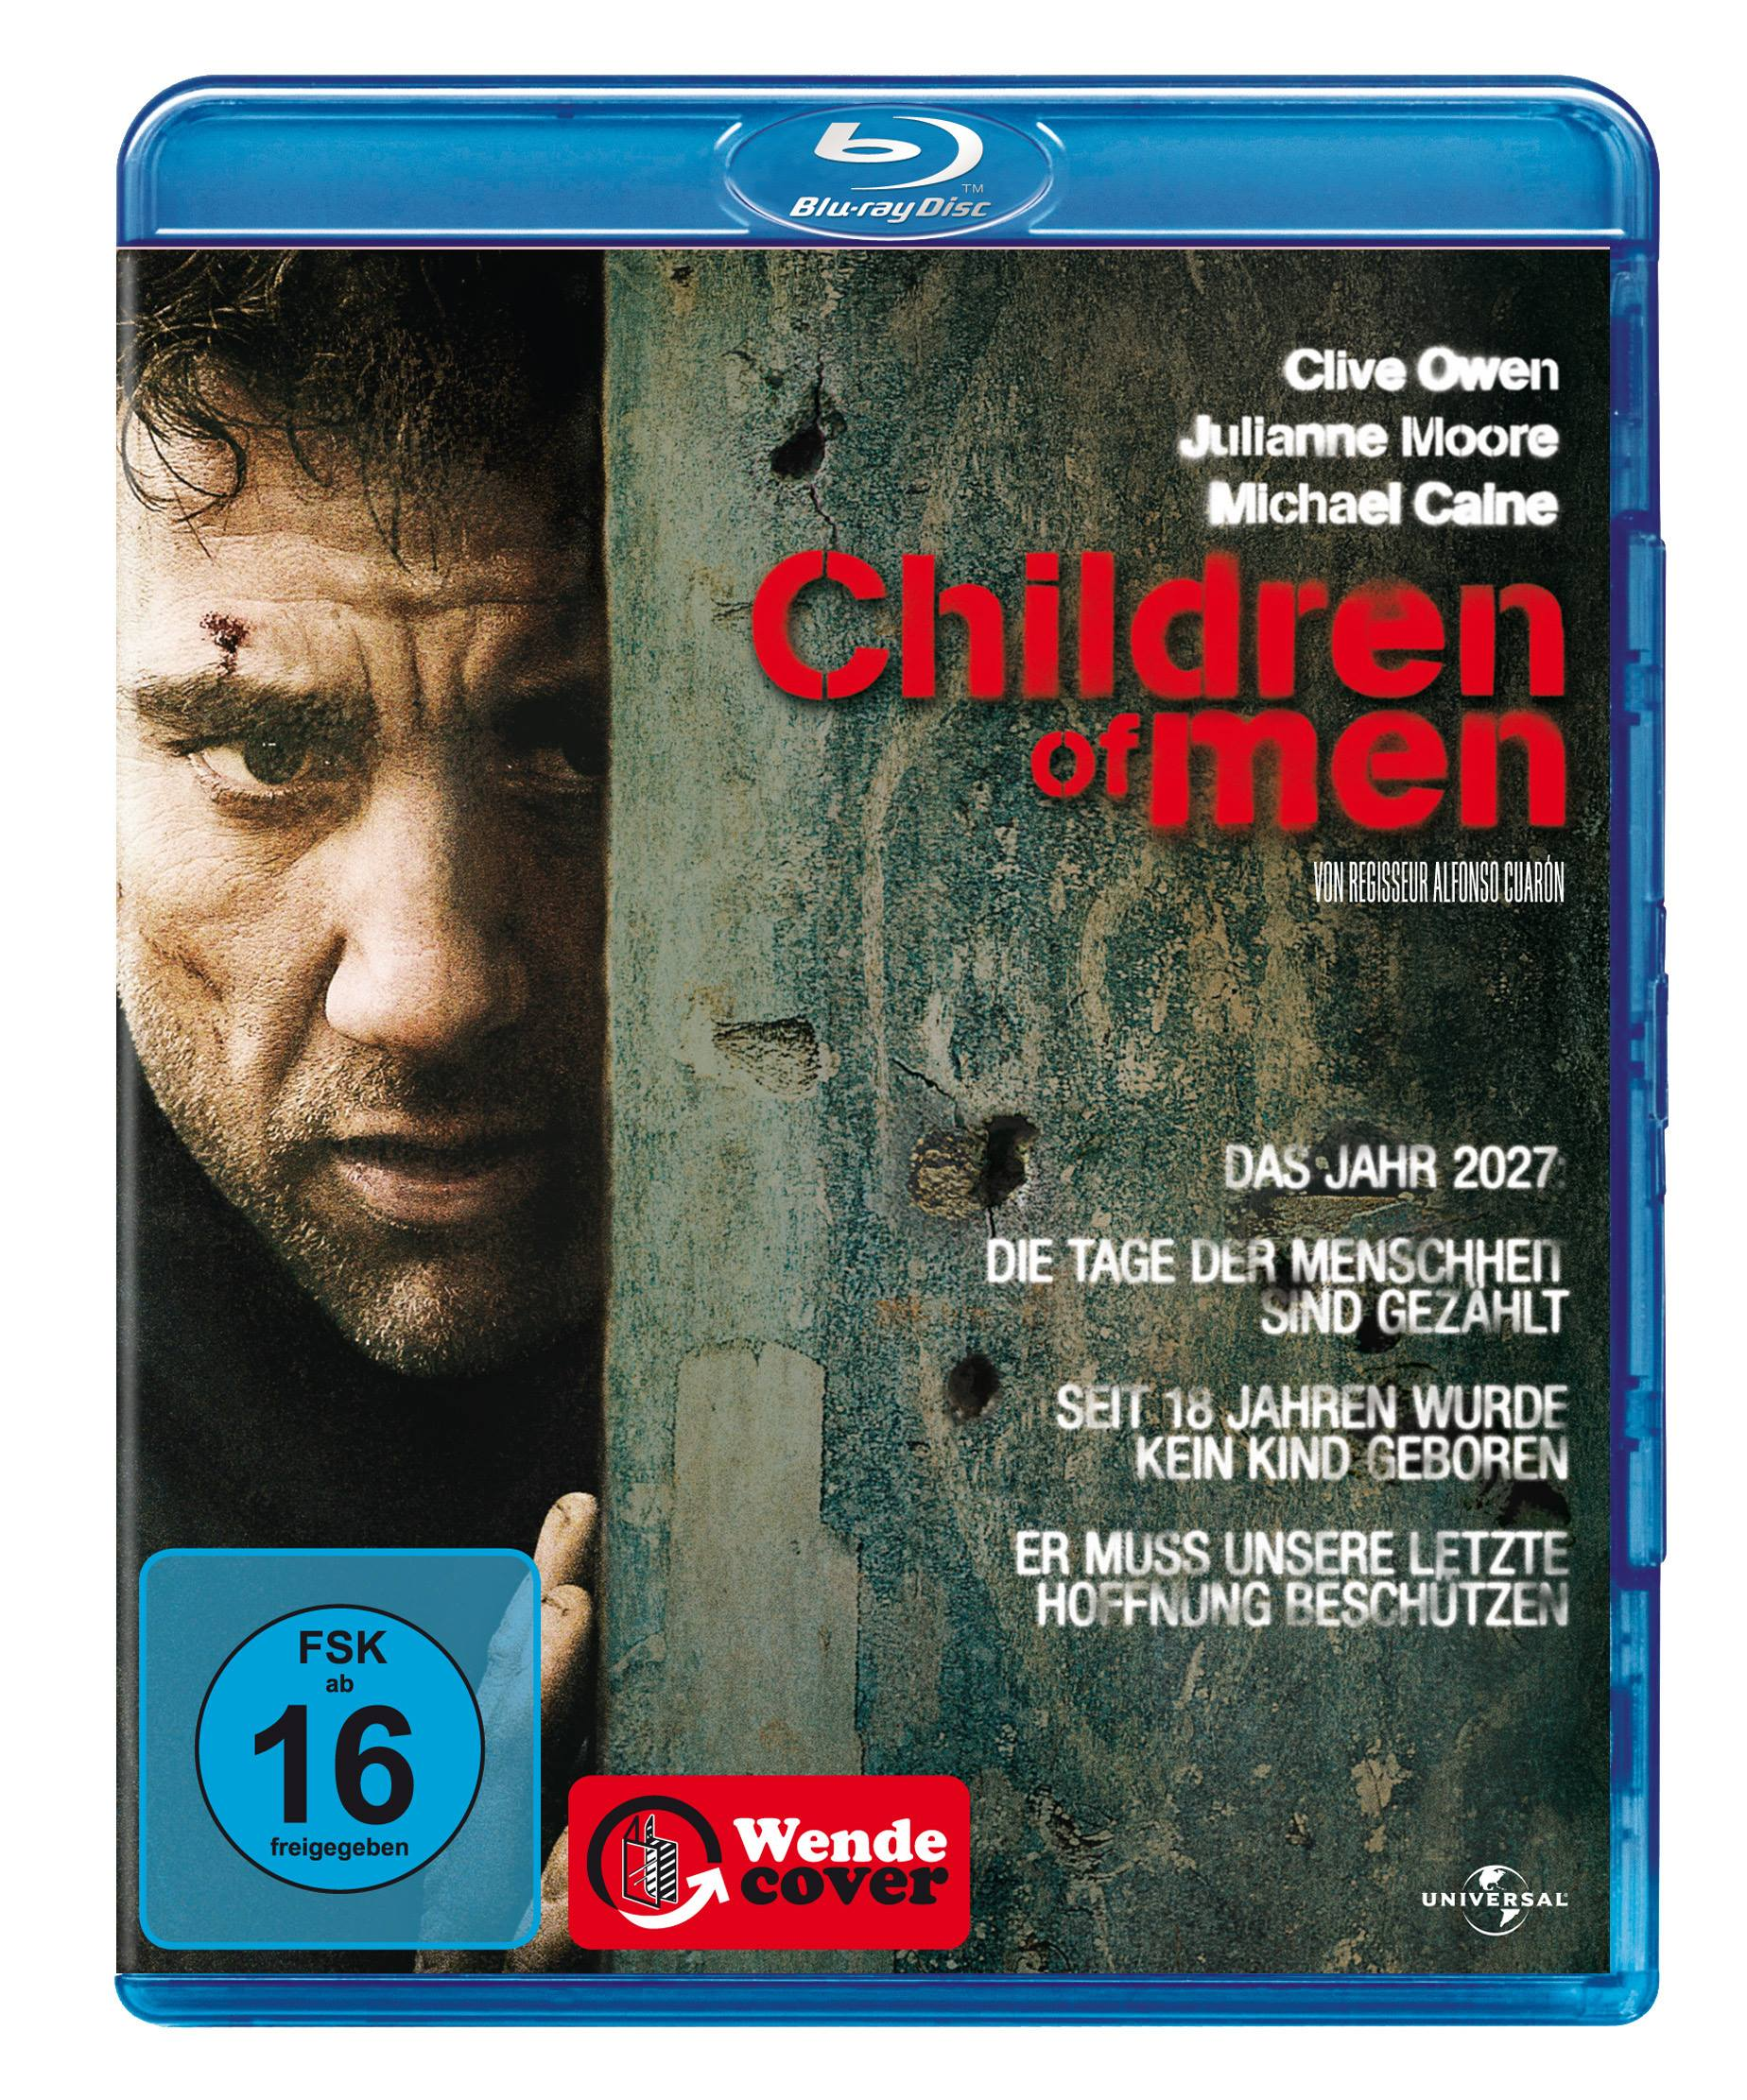 Quelle: DVD/BD Children of Men, ©Universal Pictures